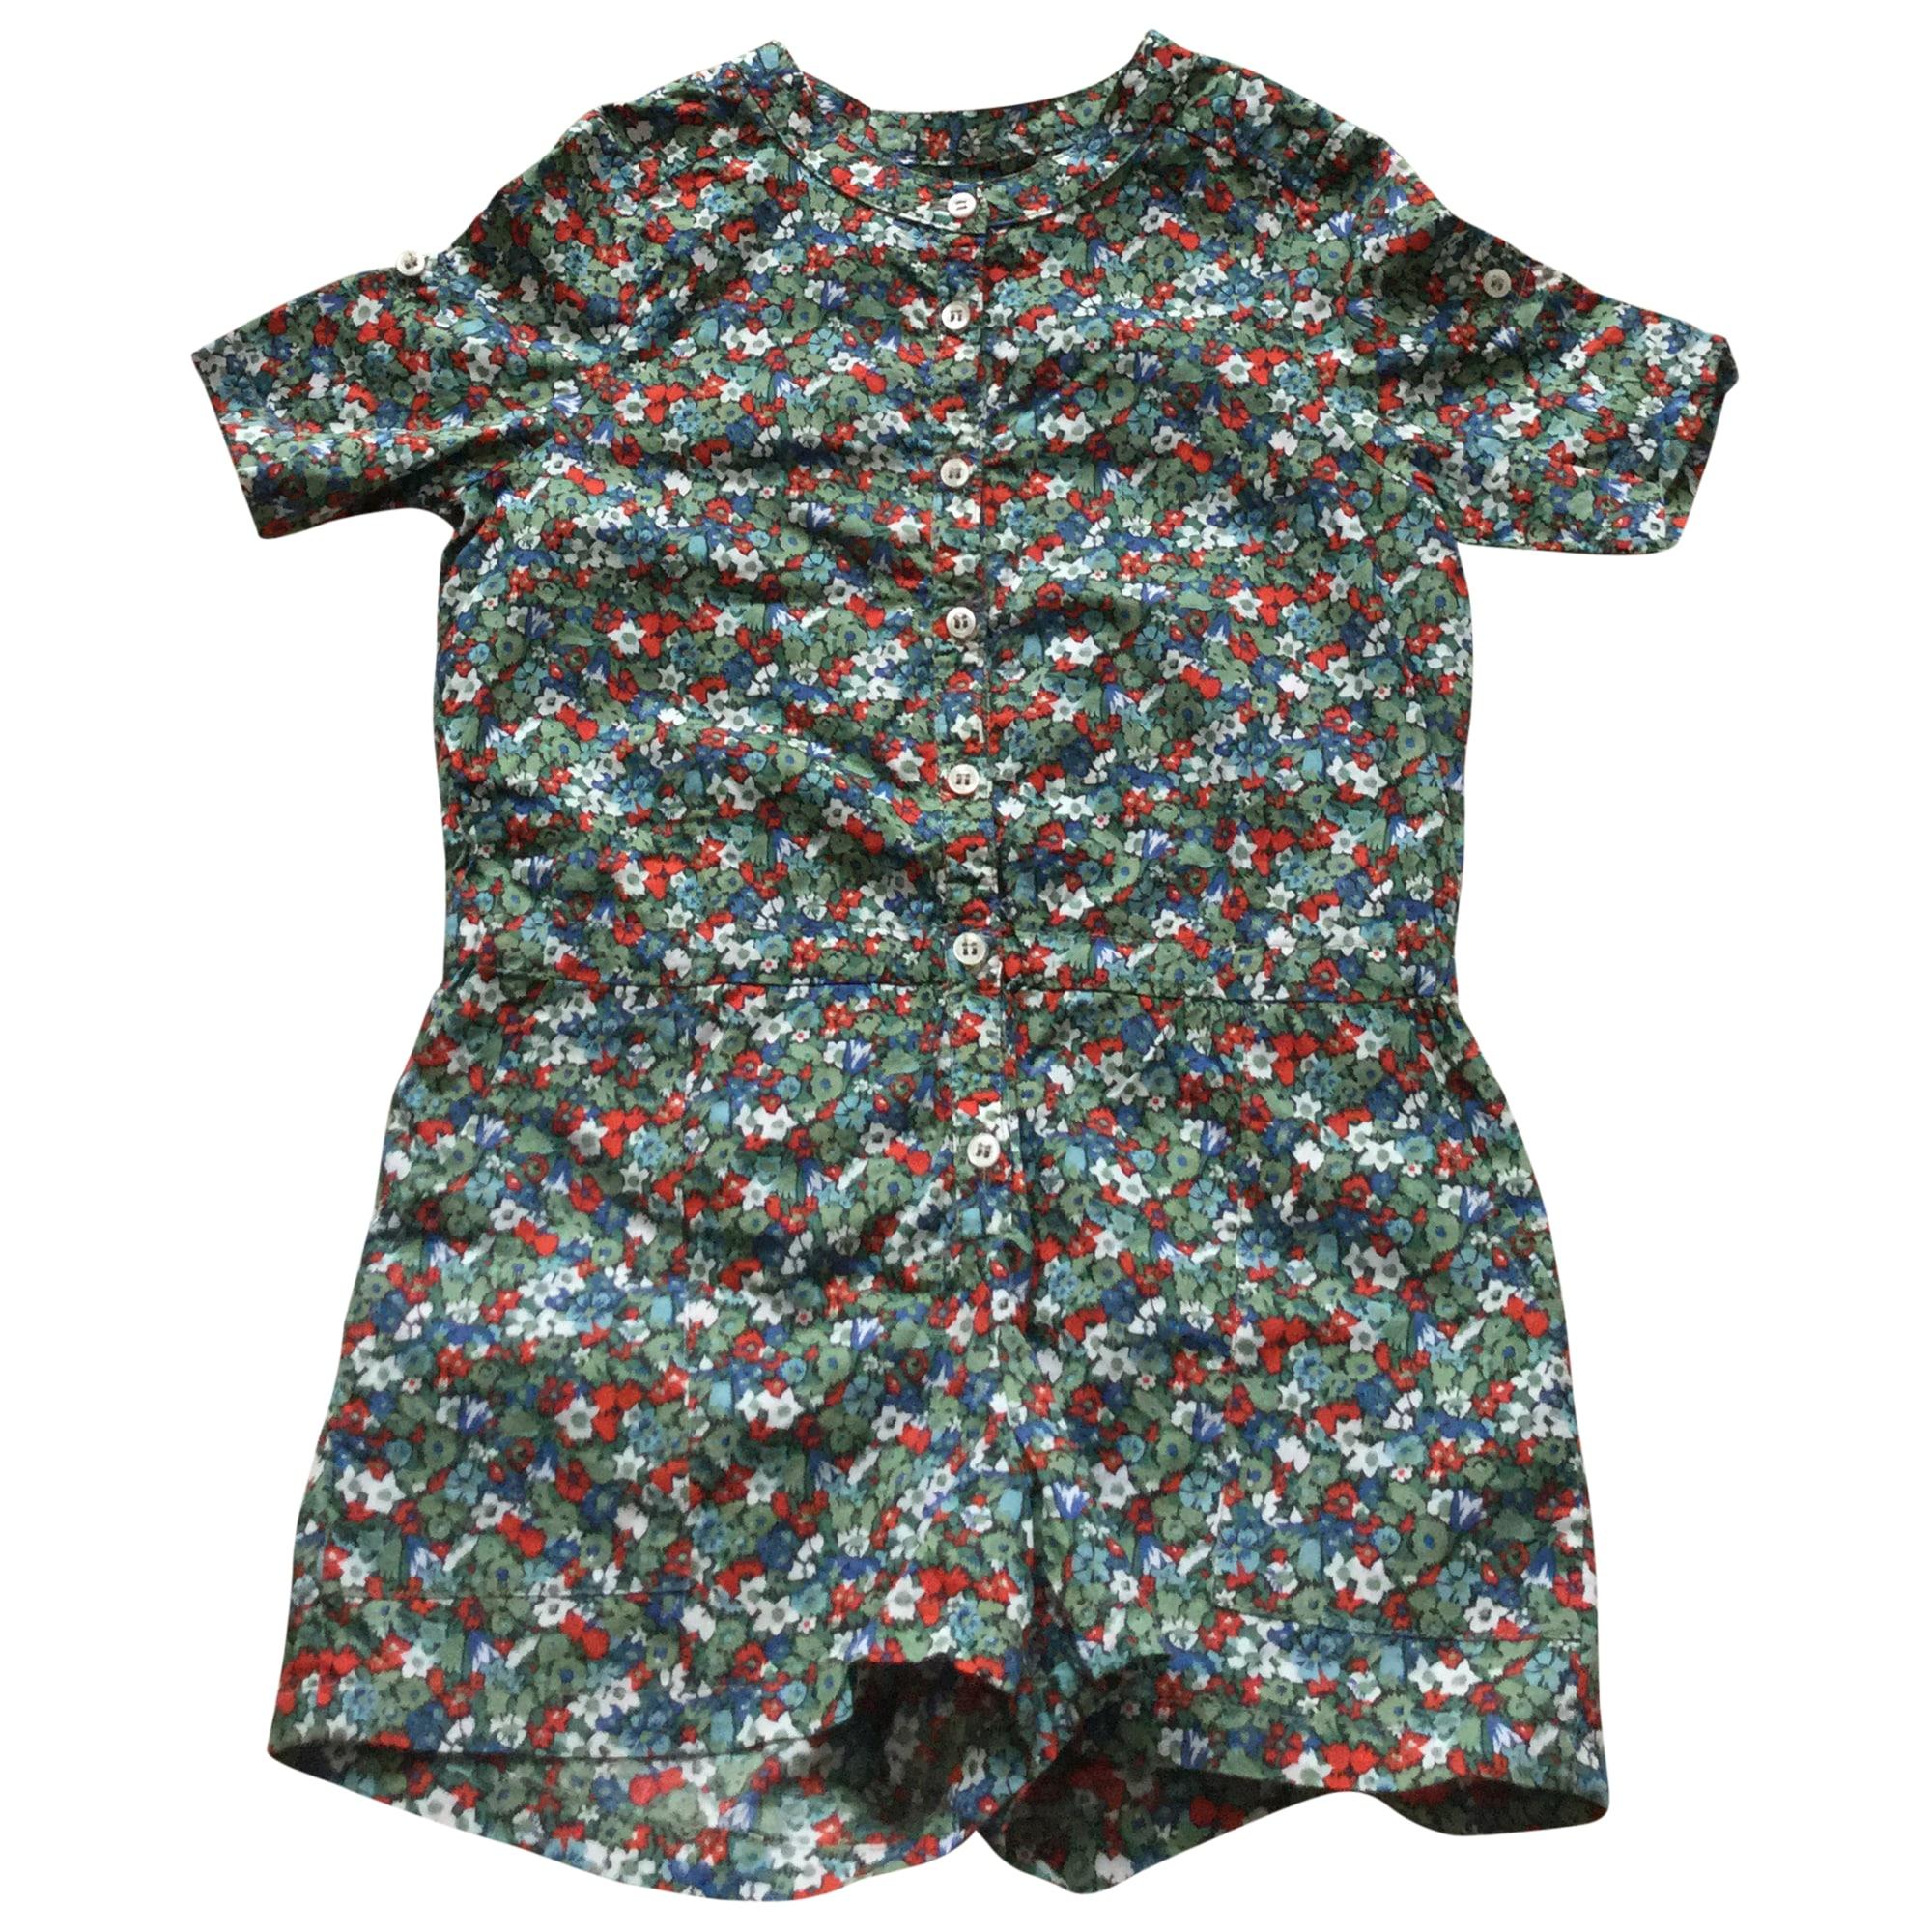 Anzug, Set für Kinder, kurz BONPOINT Grün